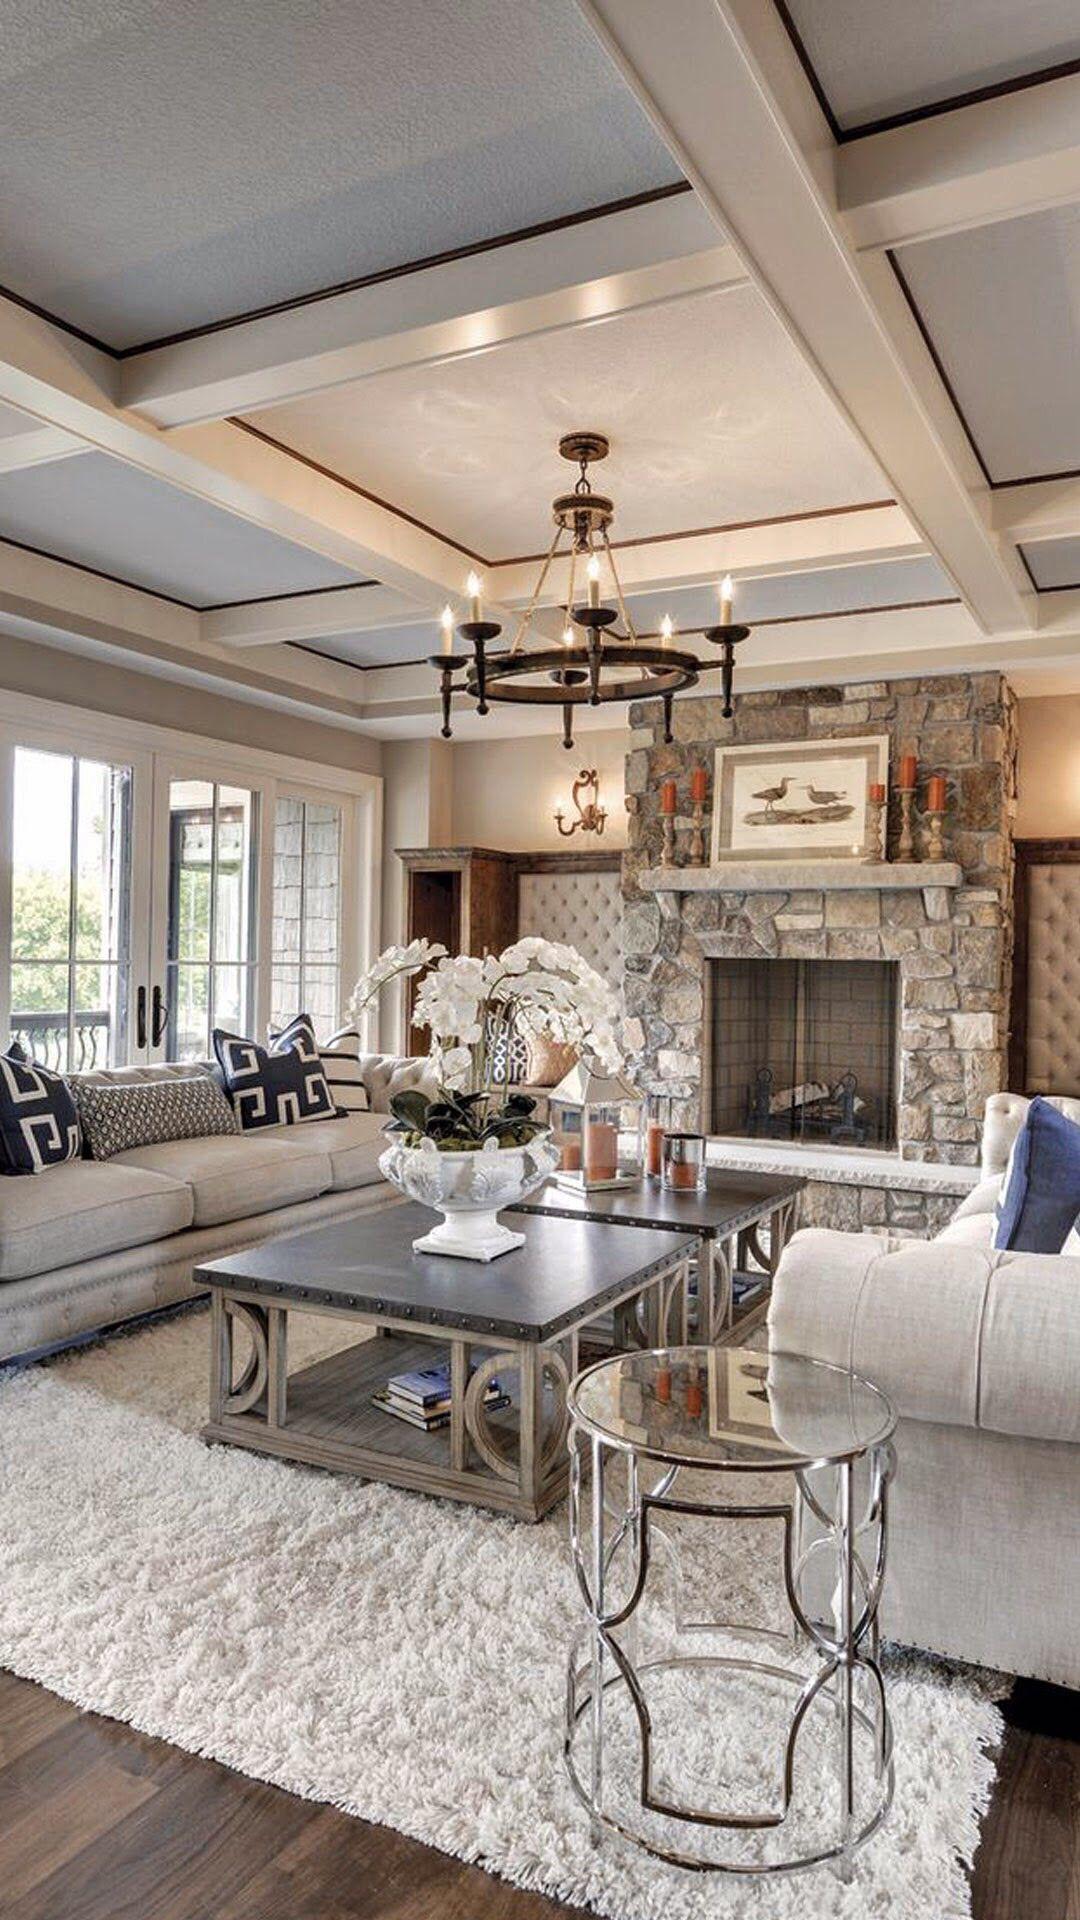 30 Amazing Image Of Houzz Living Room